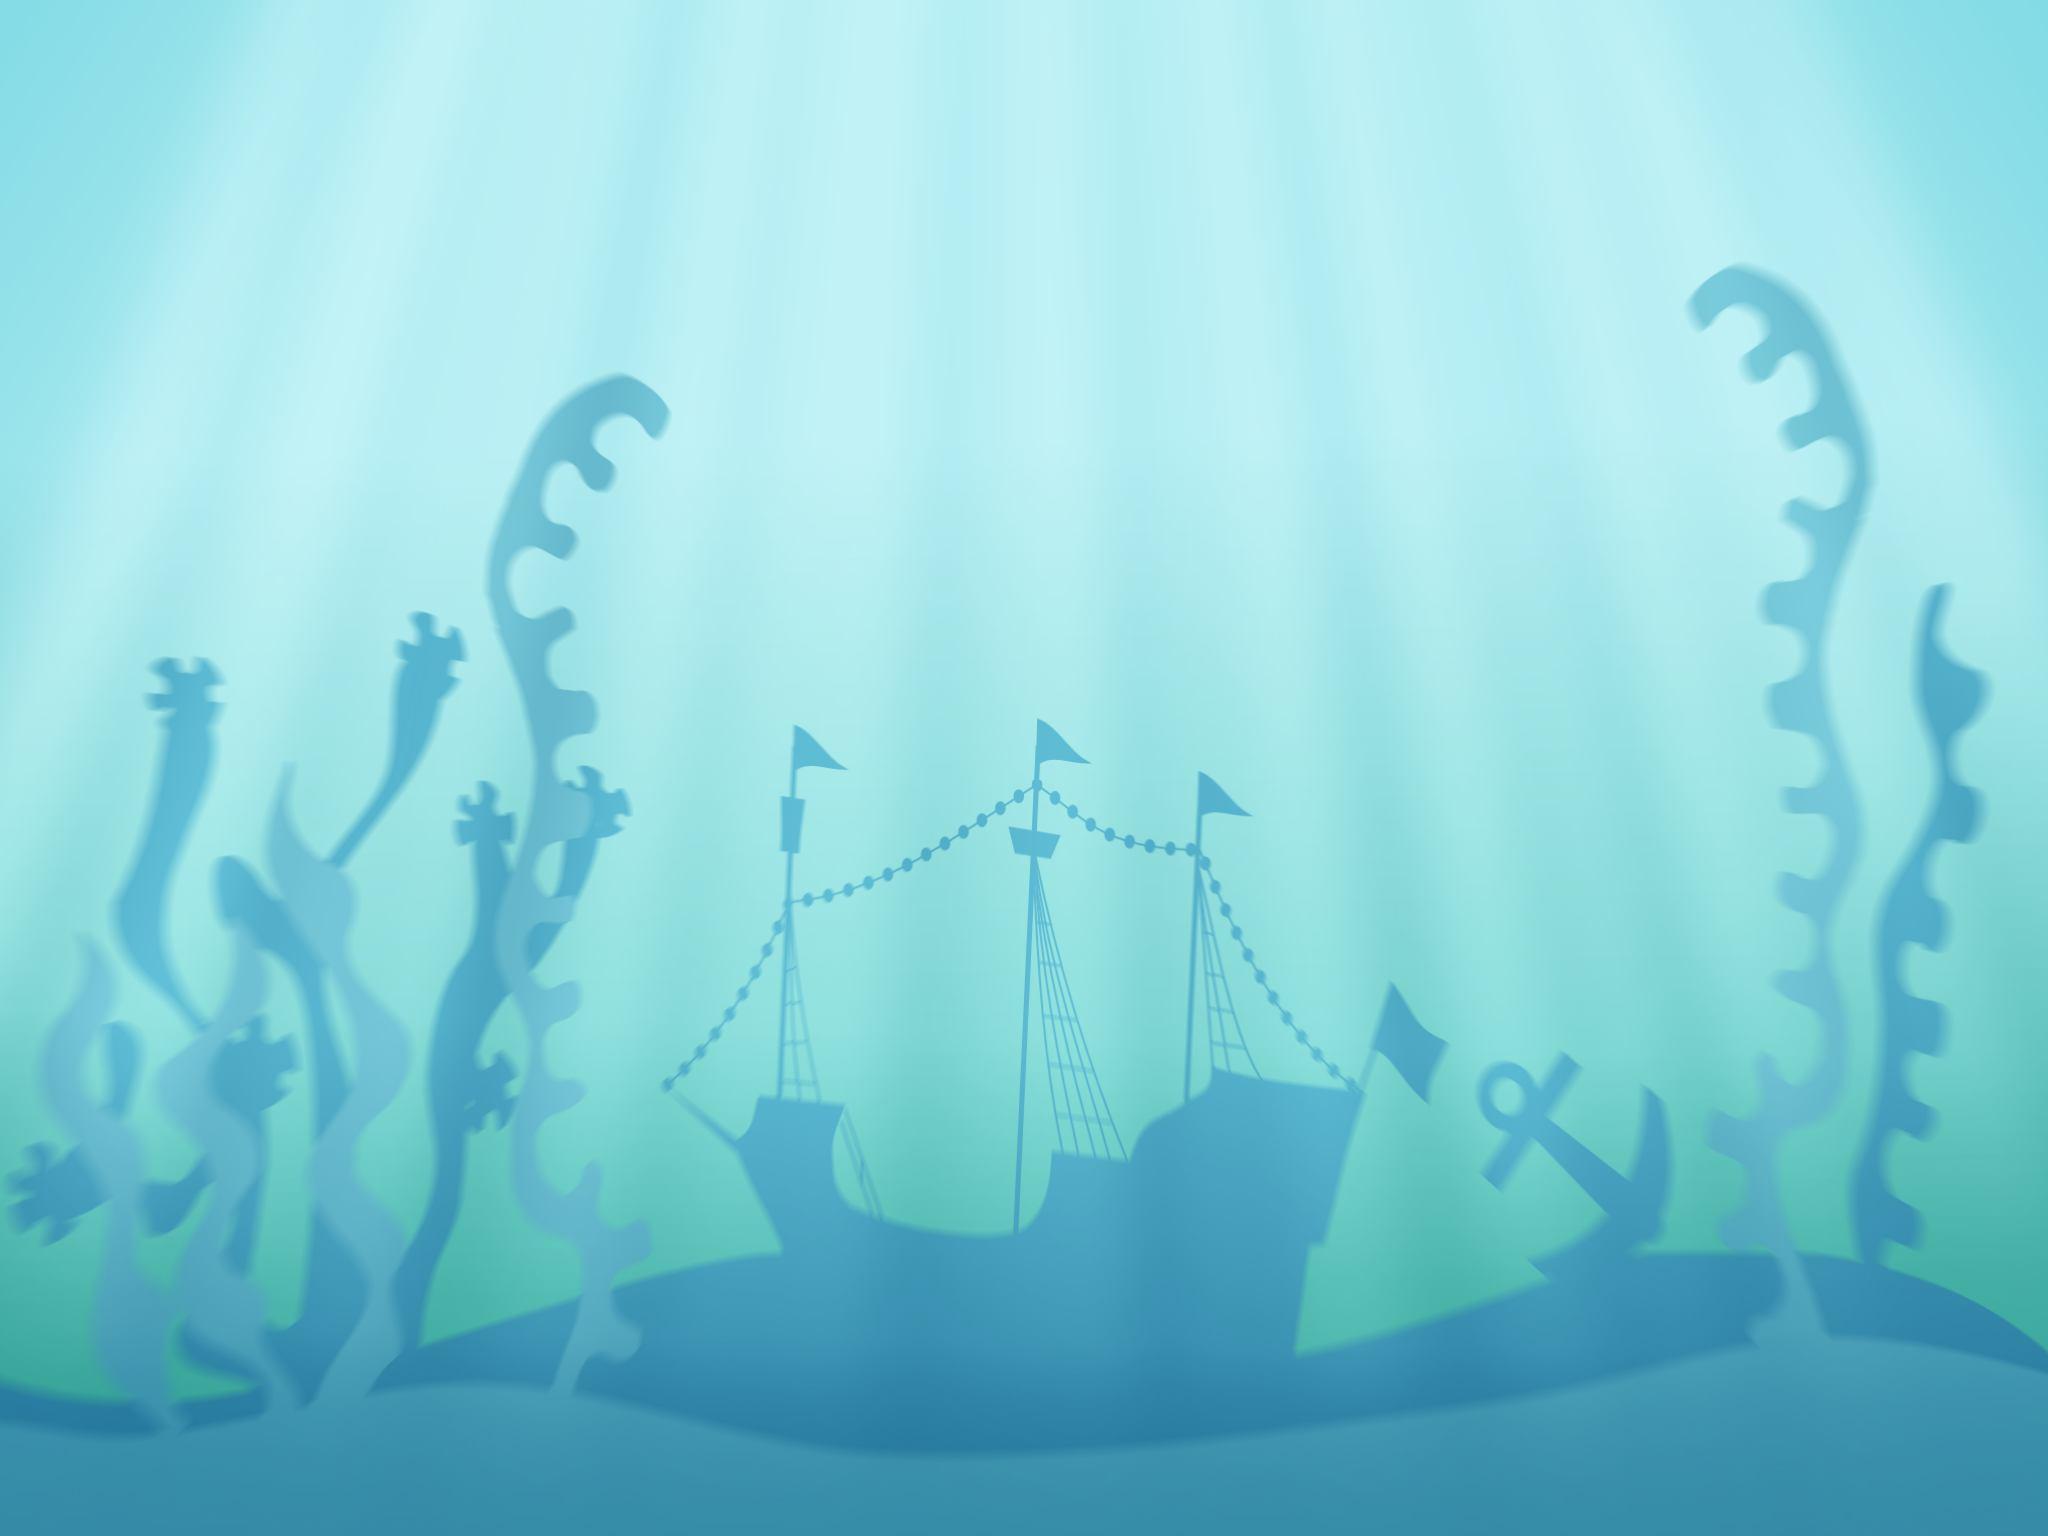 underwater cartoon wallpaper - photo #29